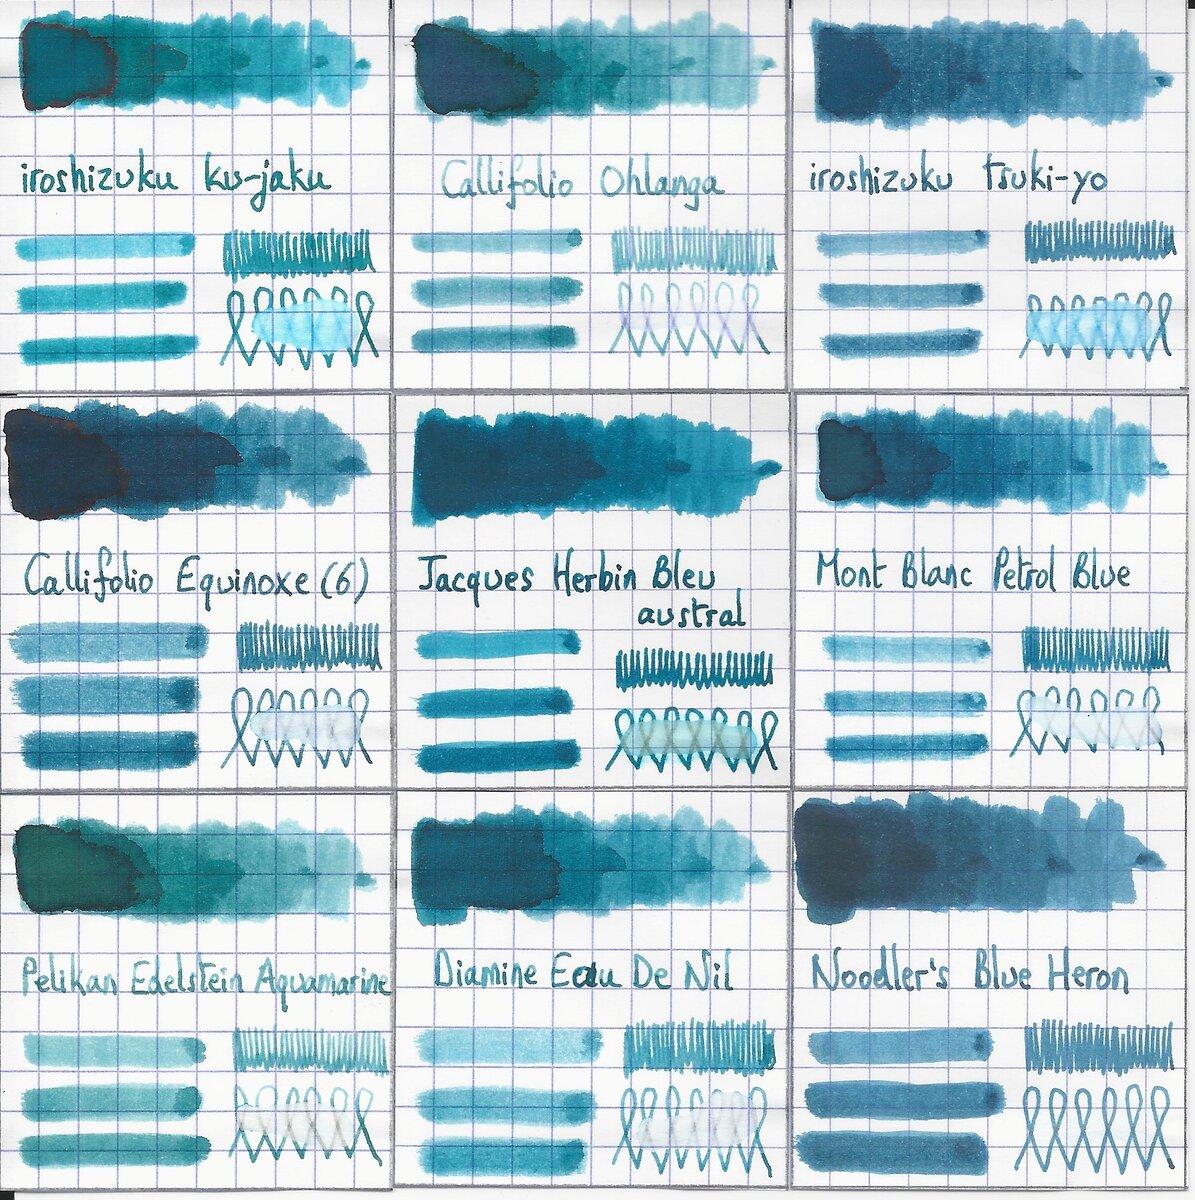 jacques herbin - bleu austral - related inks 300ppi.jpeg